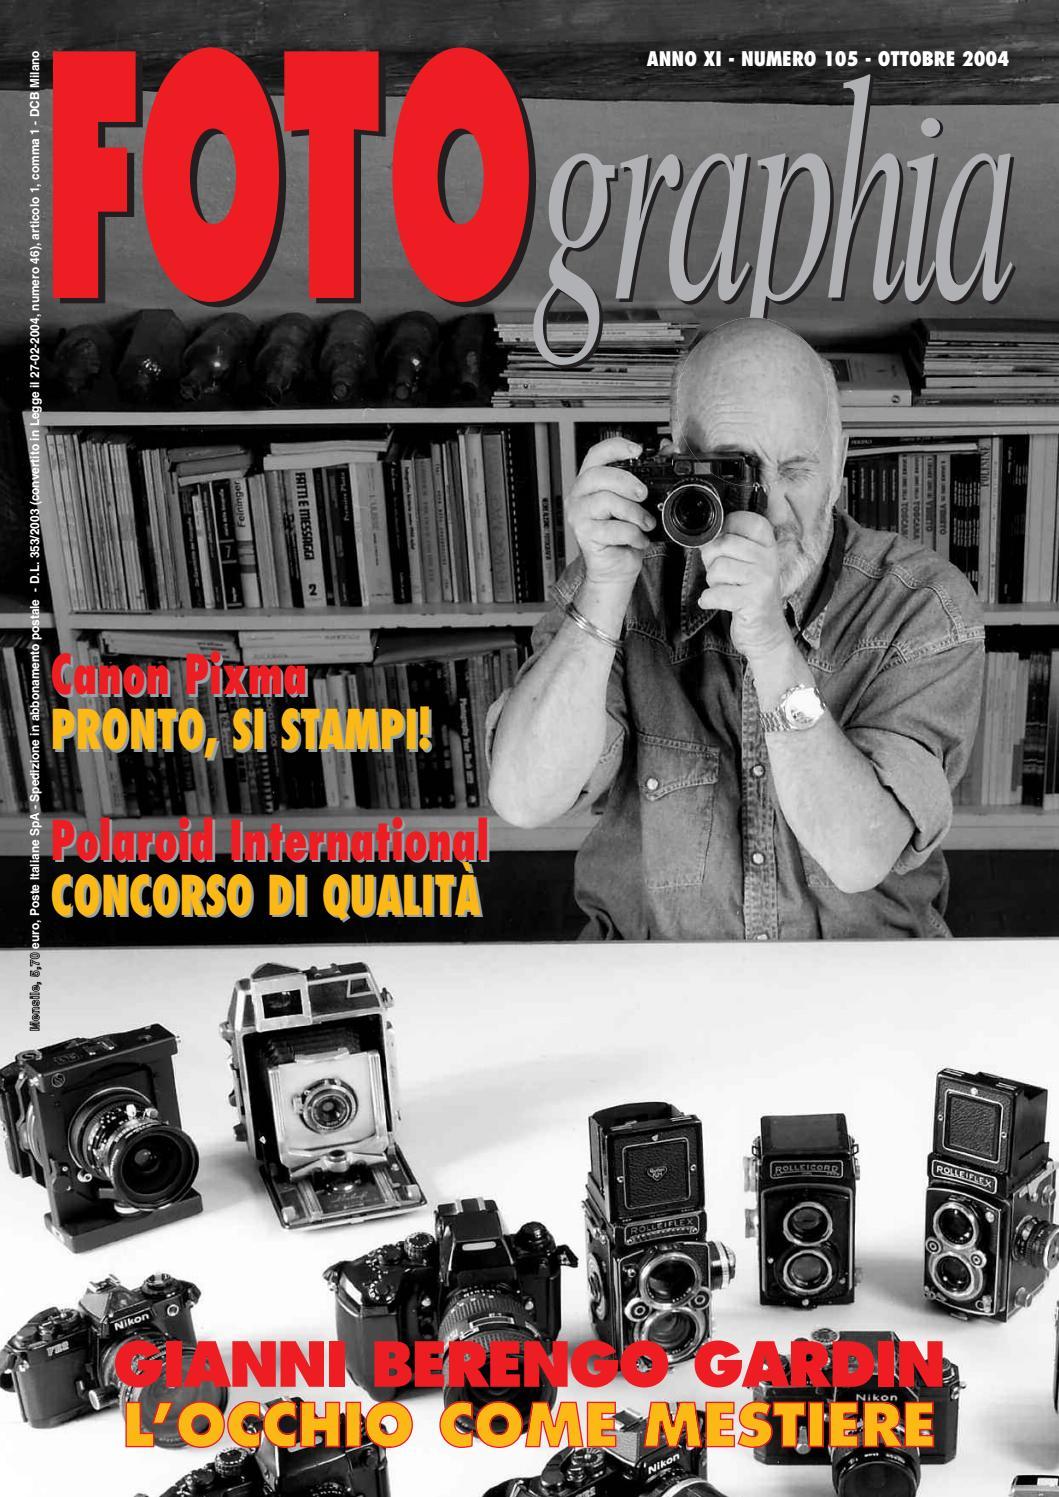 FOTOgraphia 105 ottobre 2004 by FOTOgraphia issuu